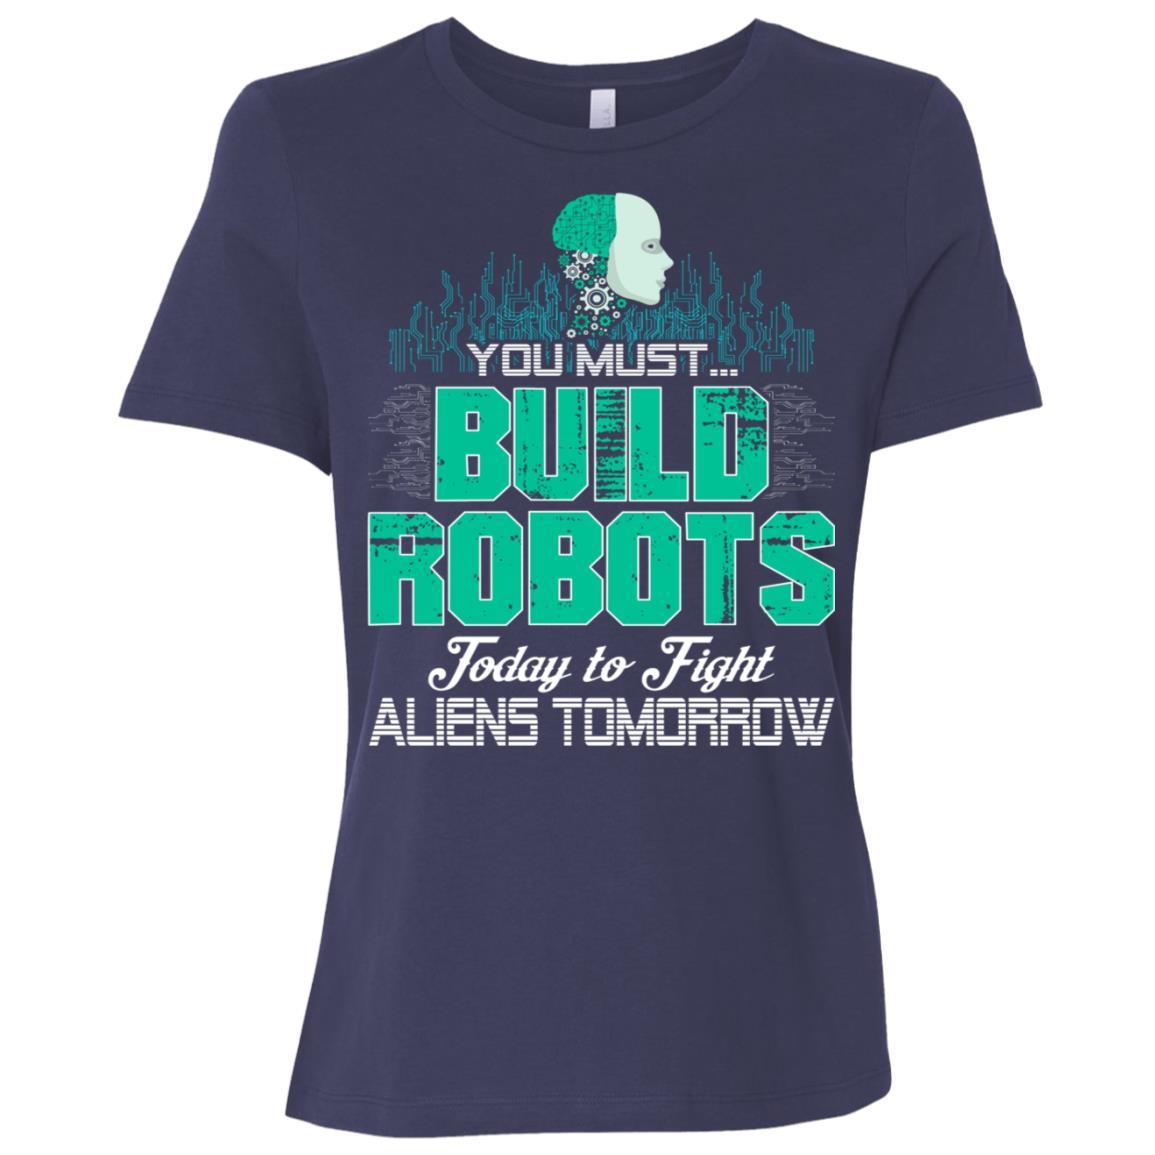 Funny Robotics Gift Women Short Sleeve T-Shirt